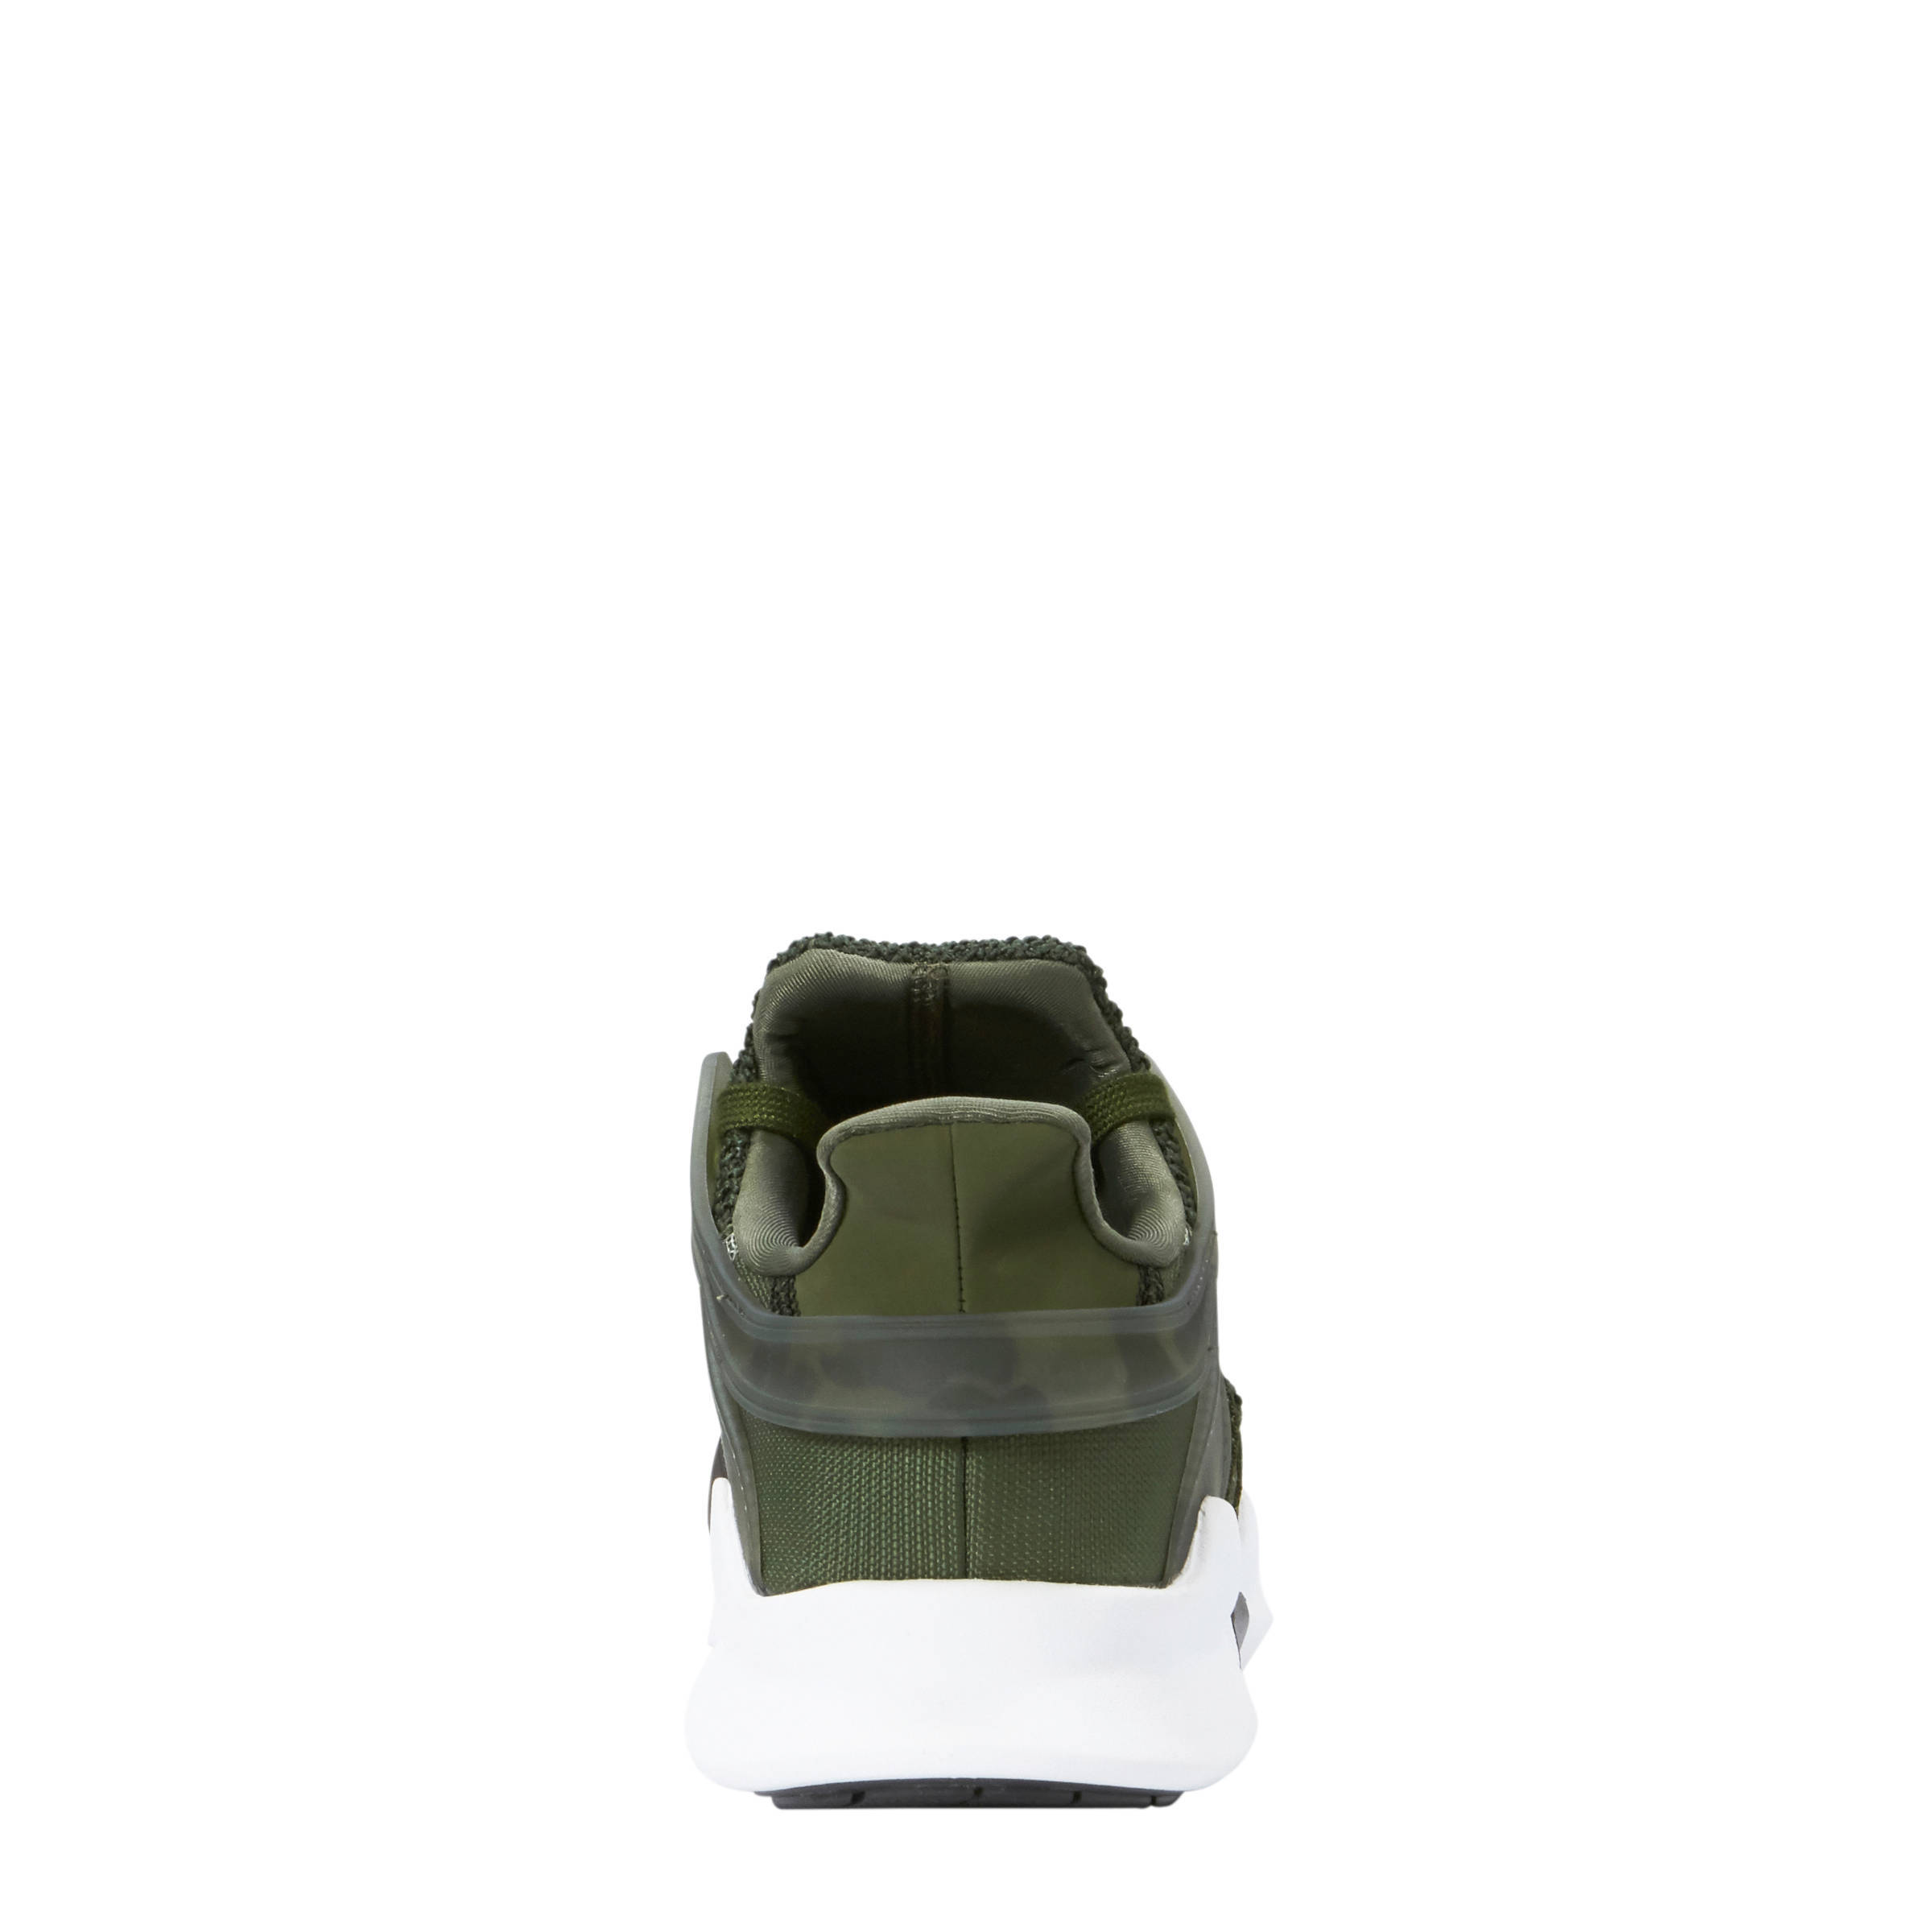 adidas eqt kinder camouflage